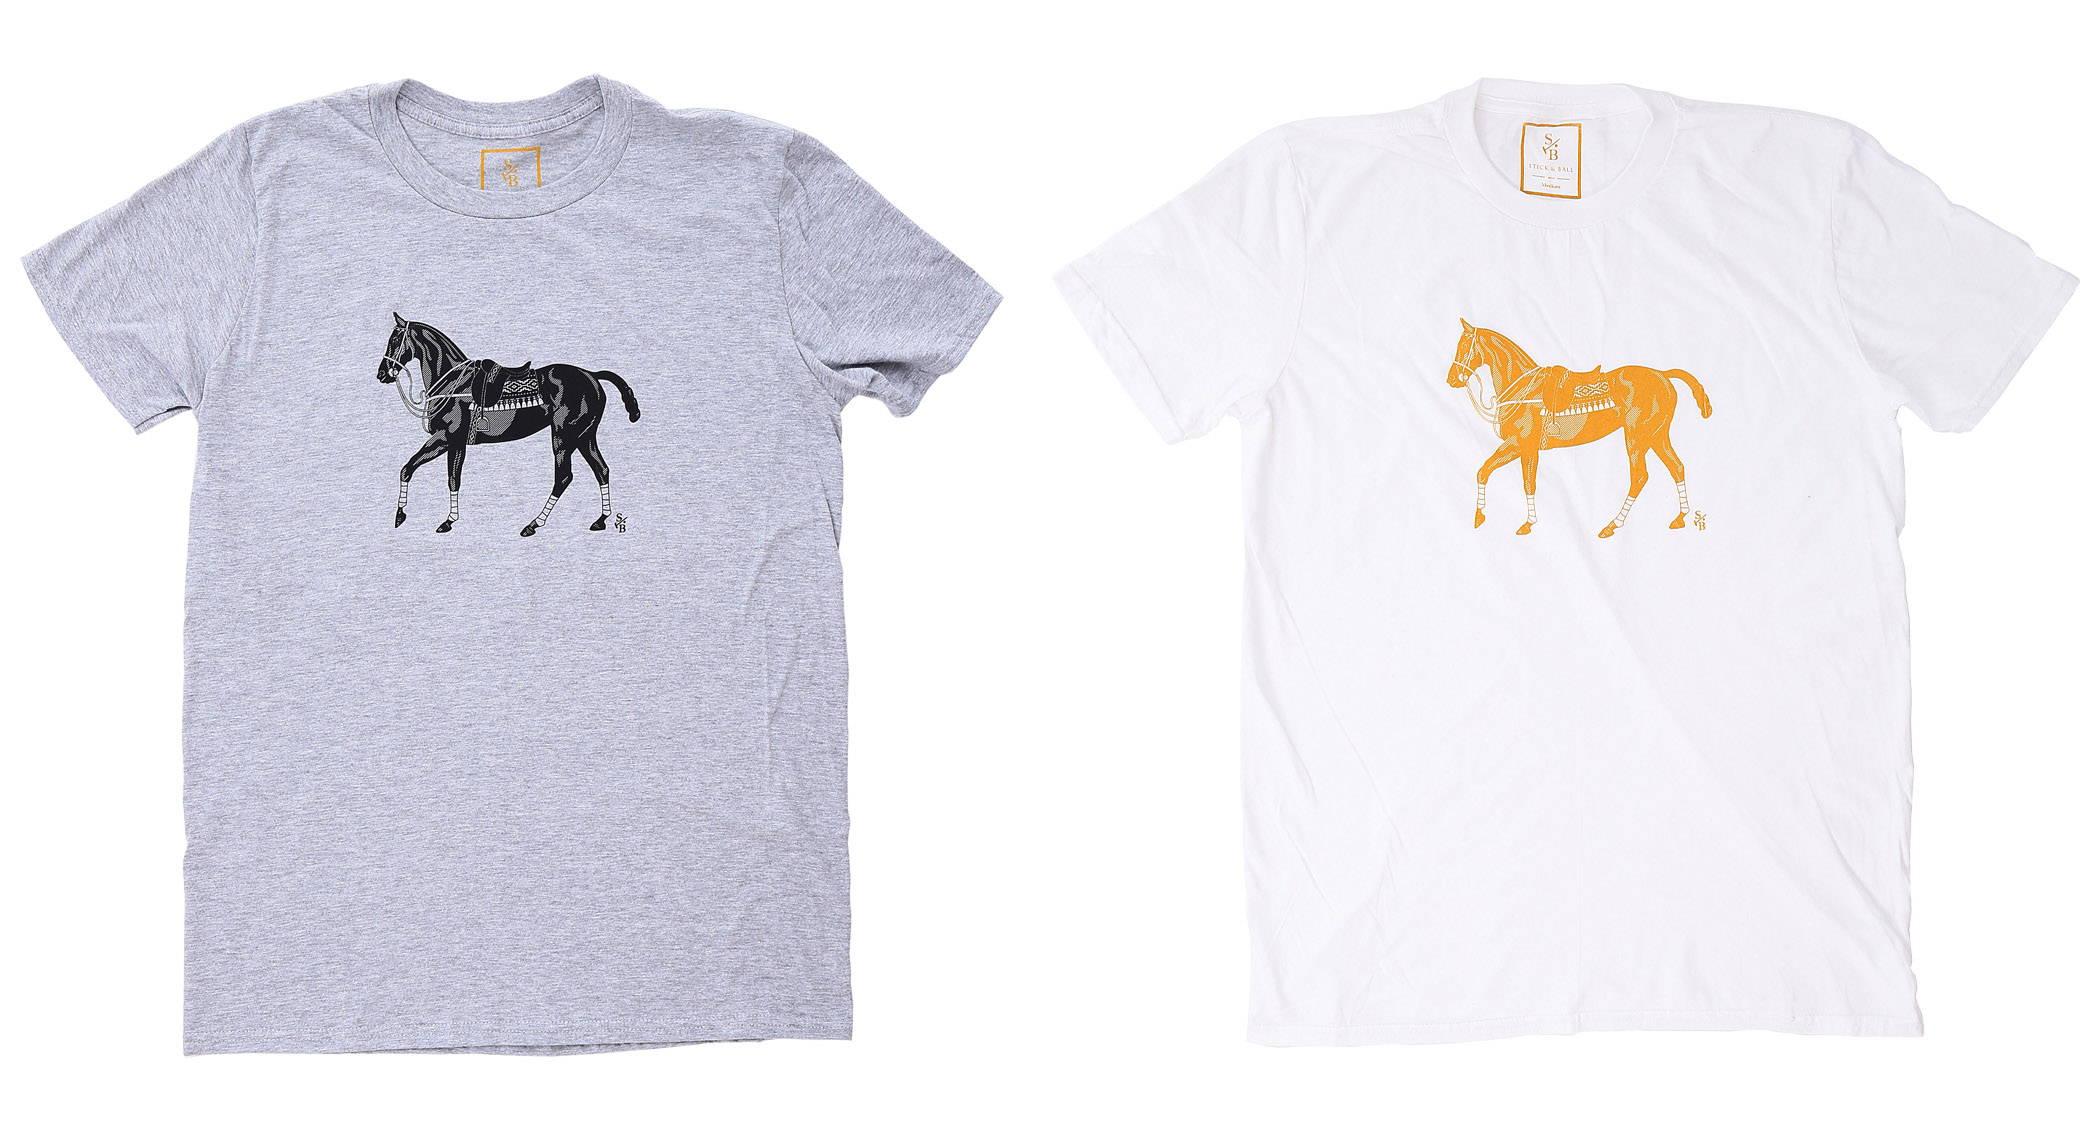 Row of Men's designer polo pony tees in white & grey - Stick & Ball